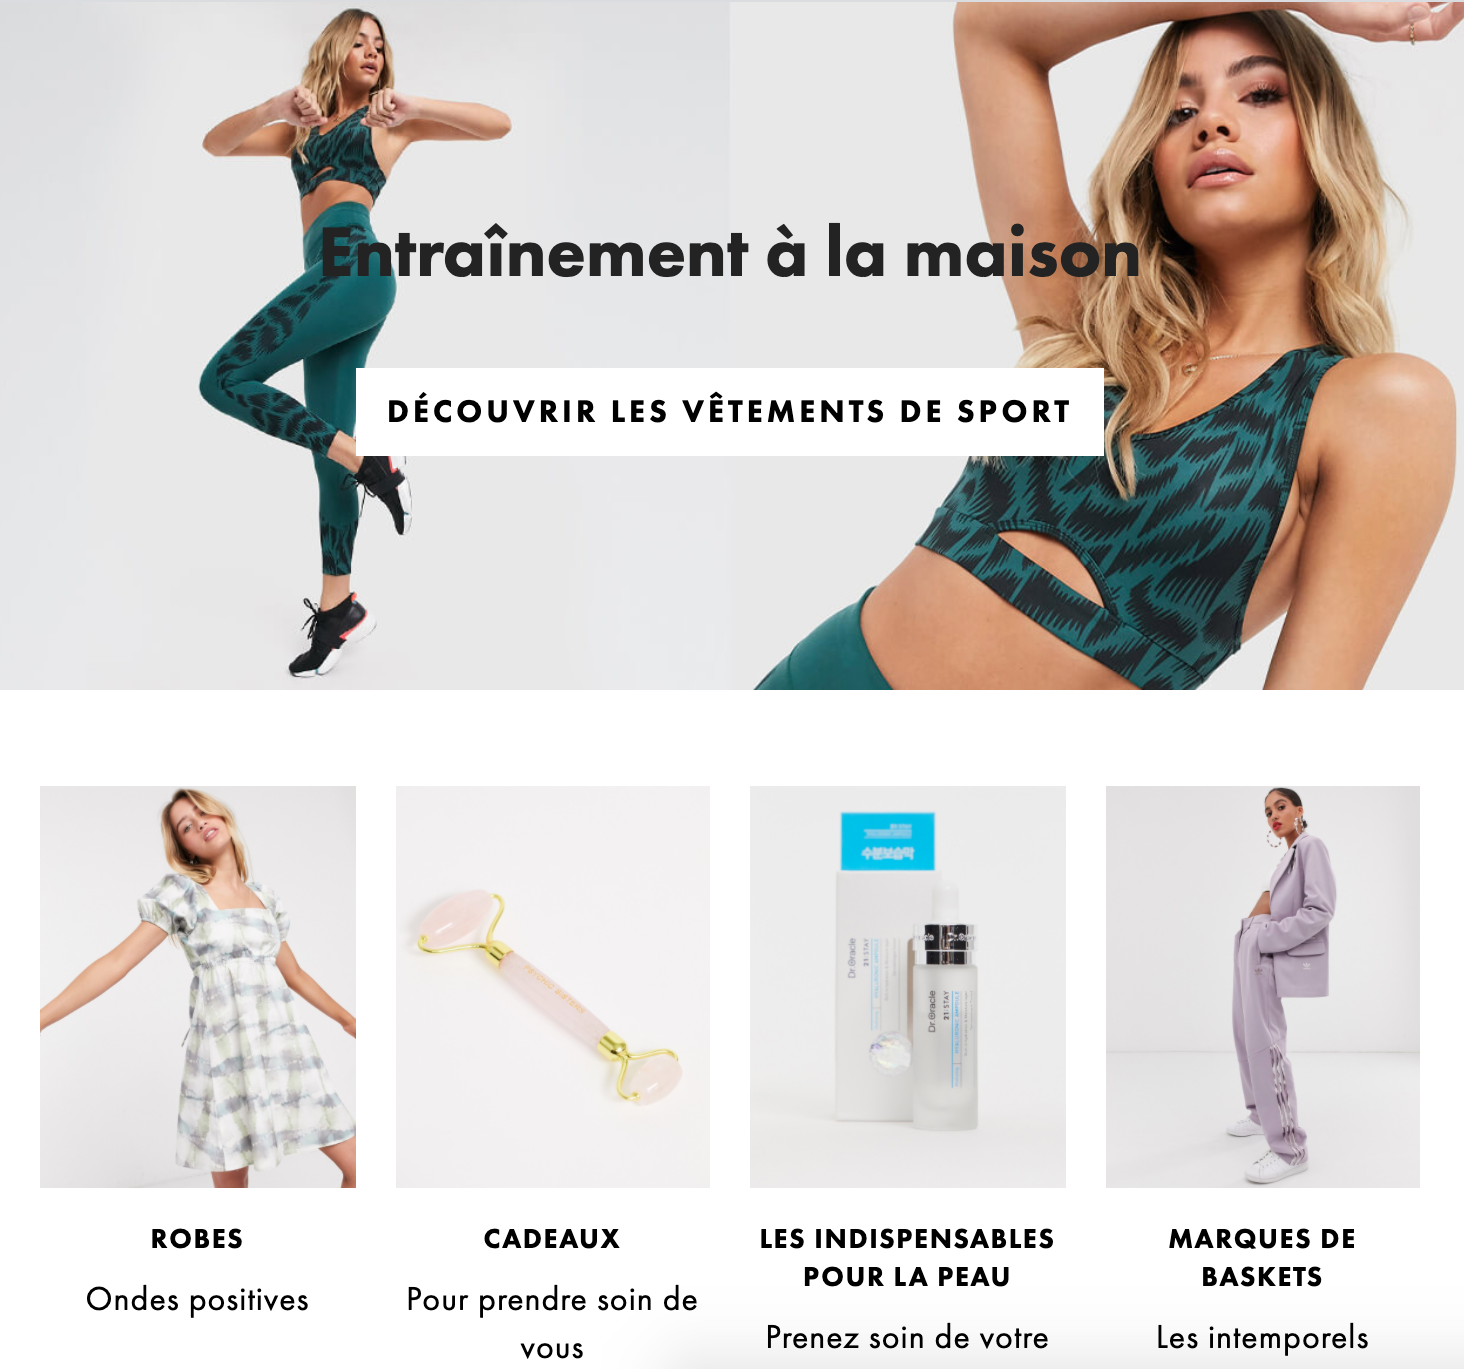 Collection de vêtements confortables de la marque Asos